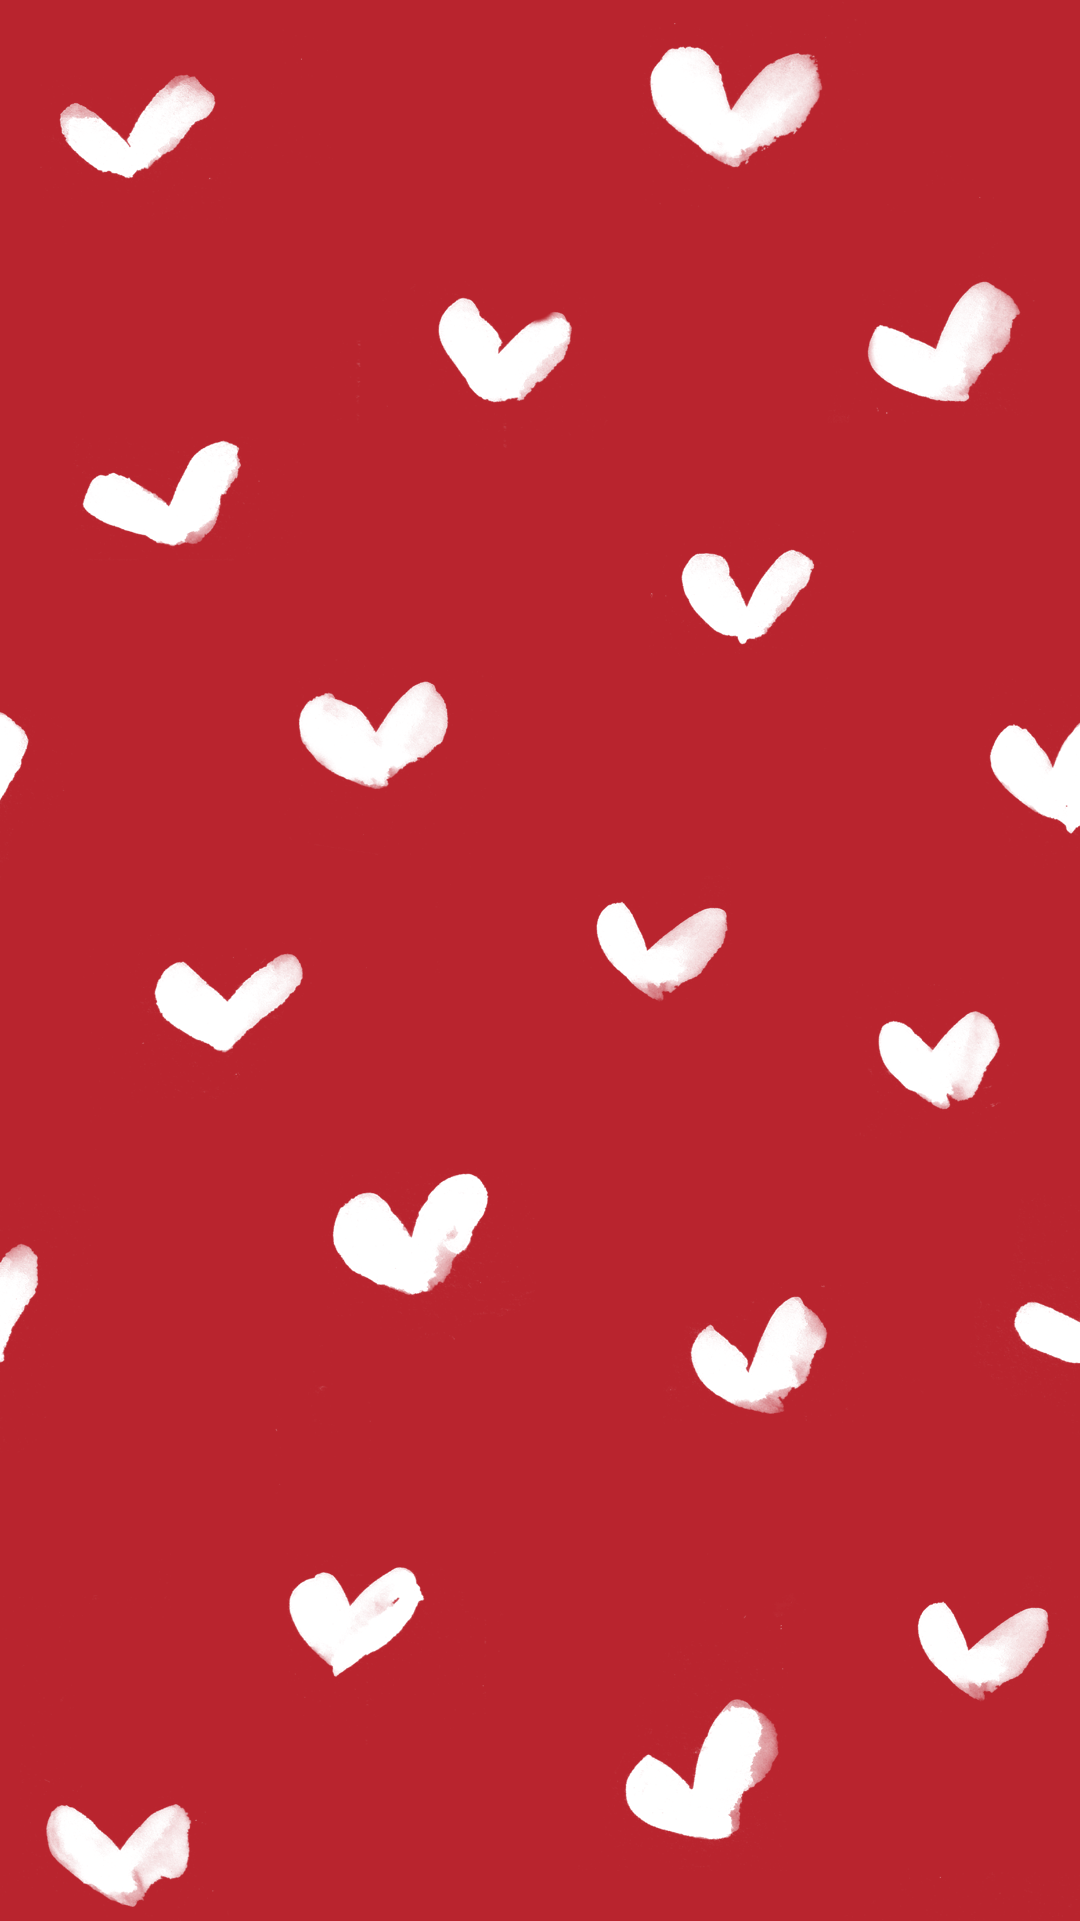 8 Free Heart Phone Wallpaper Downloads - Flirty Hearts Red